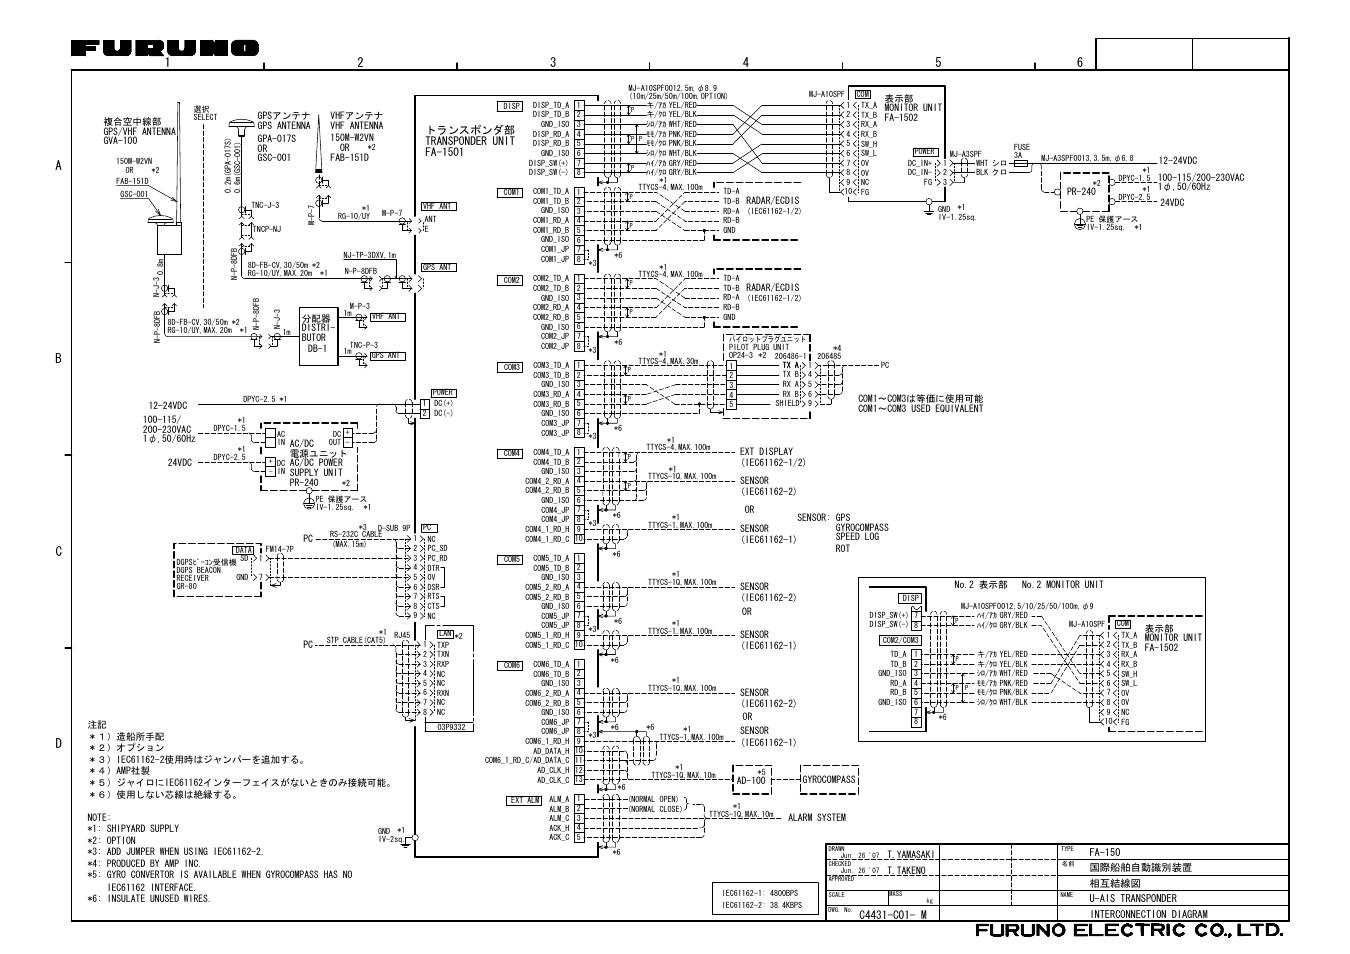 interconnection diagram cb d a transponder unit rh manualsdir com Example User Guide furuno fa 150 operation manual